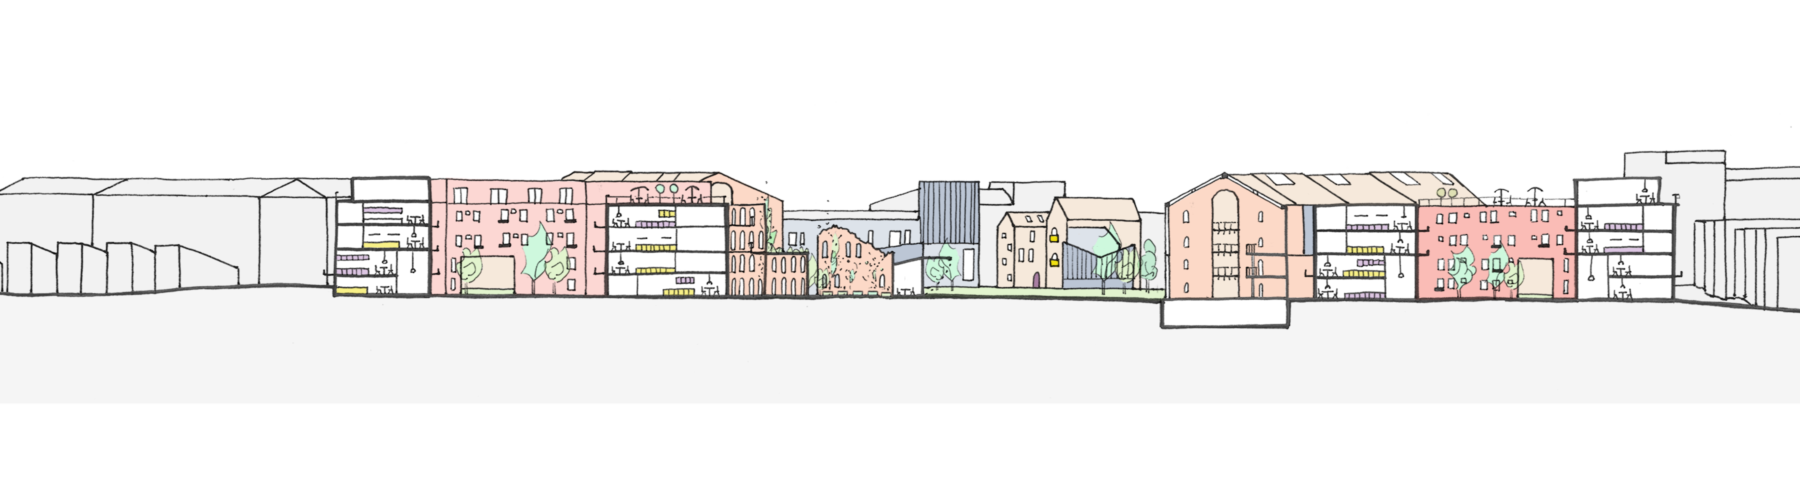 Sarah-Wigglesworth-Architects Unlocking-Pentonville Site-Section-BB Drawing 3600